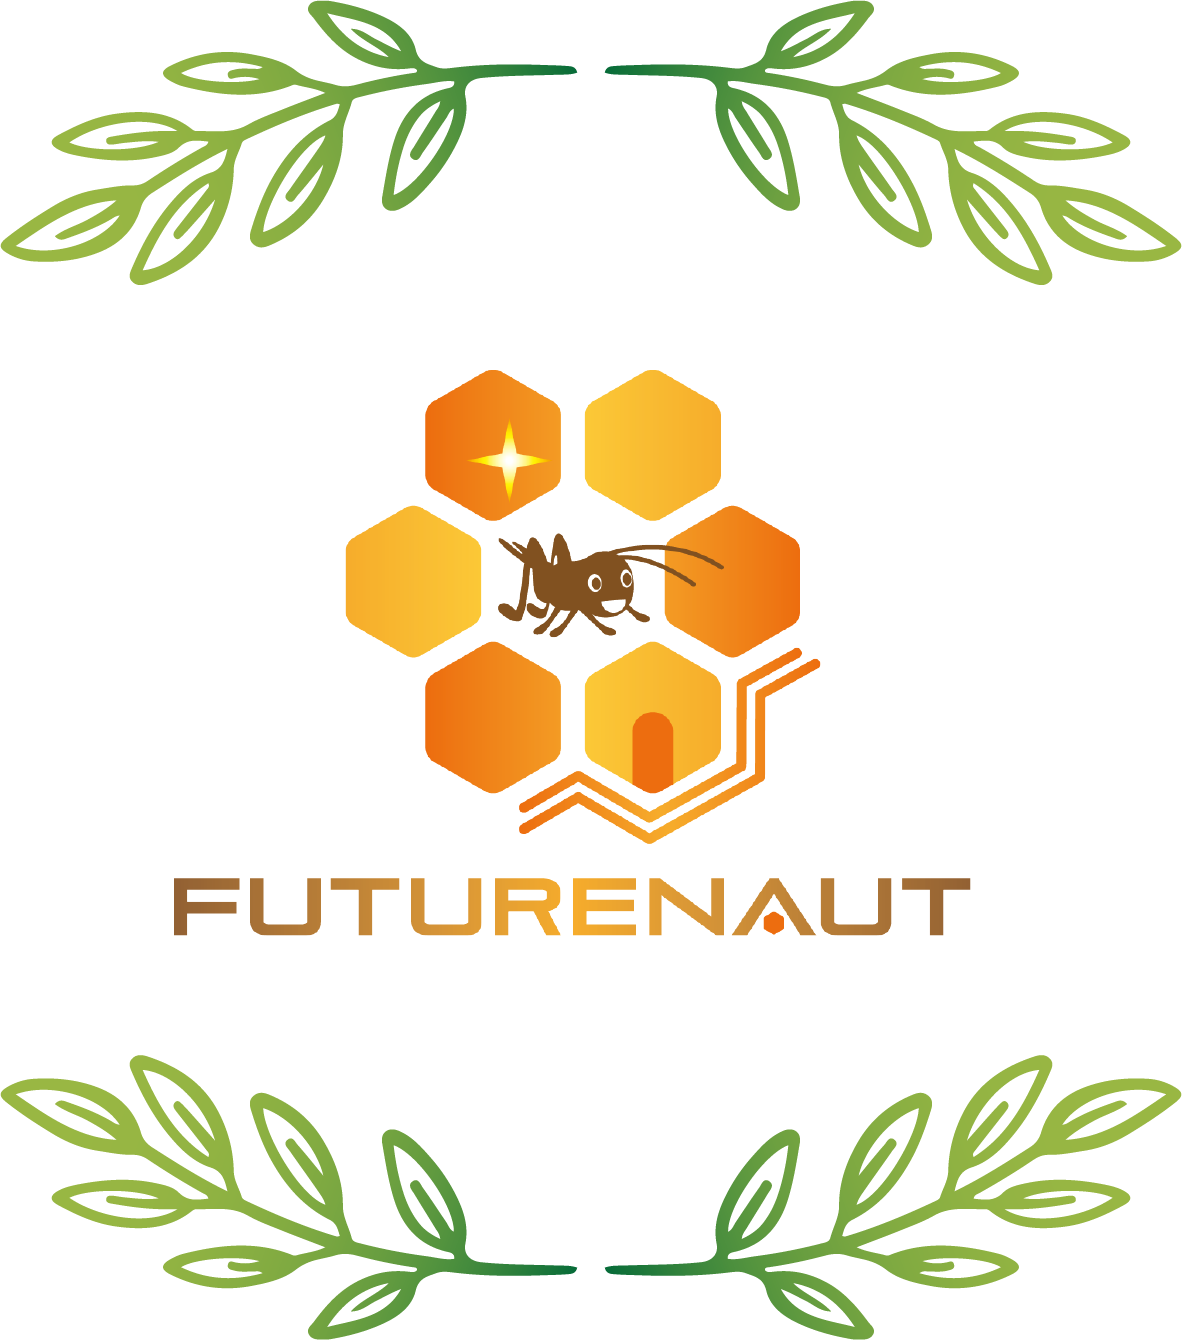 Futurenaut logo